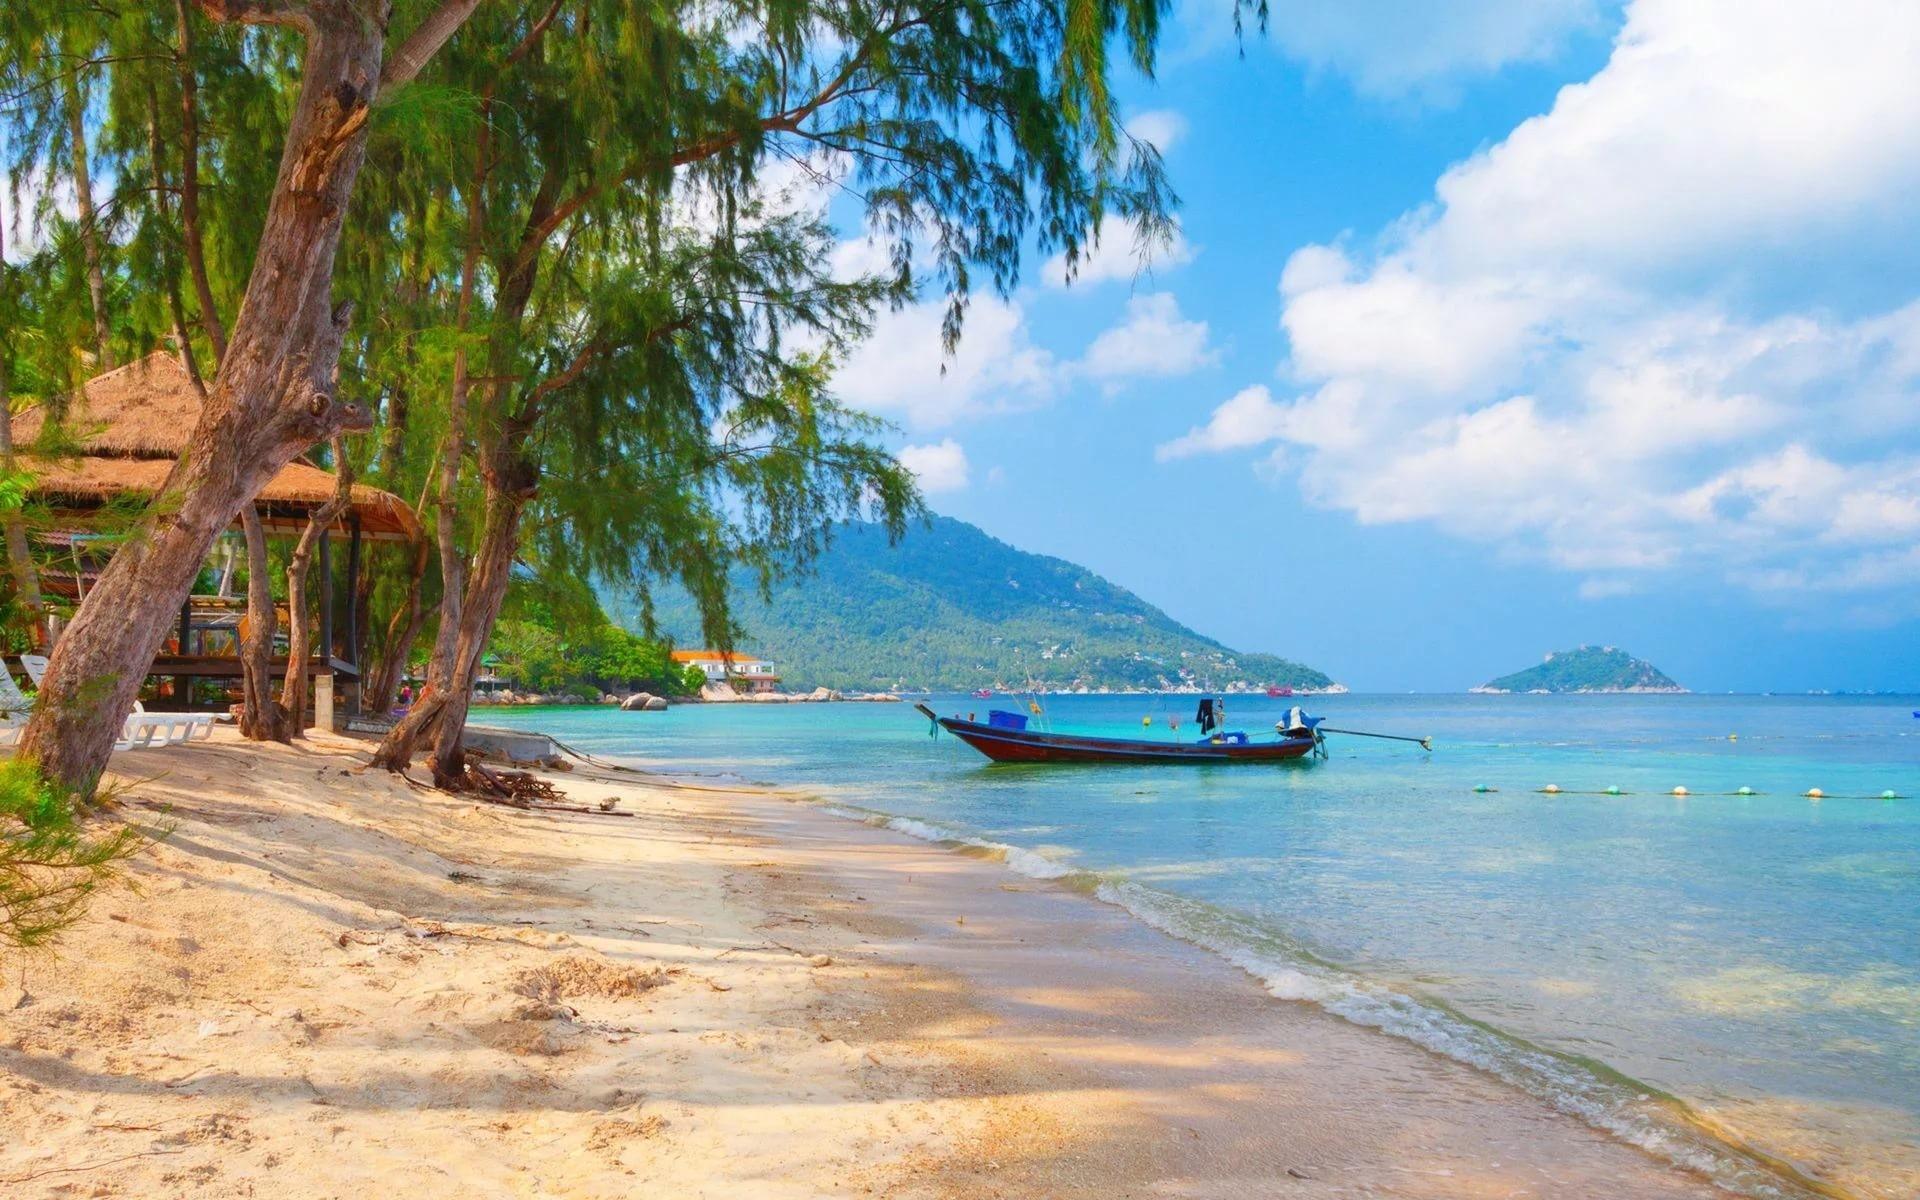 Какое море или океан омывает Таиланд